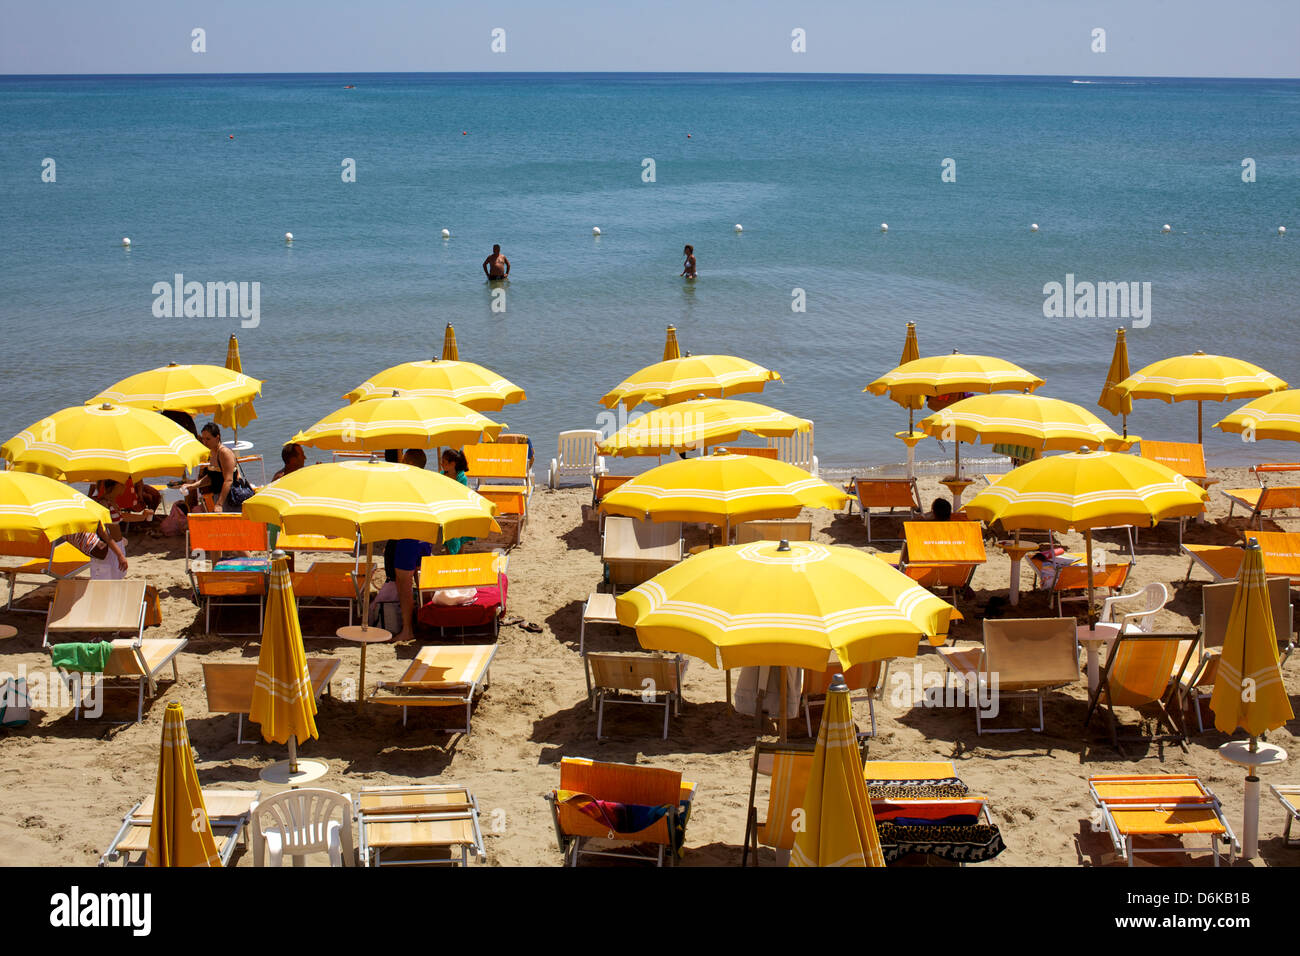 A classical Lido on the Ionian Sea, on the Basilcata south coast, Italy, Europe - Stock Image